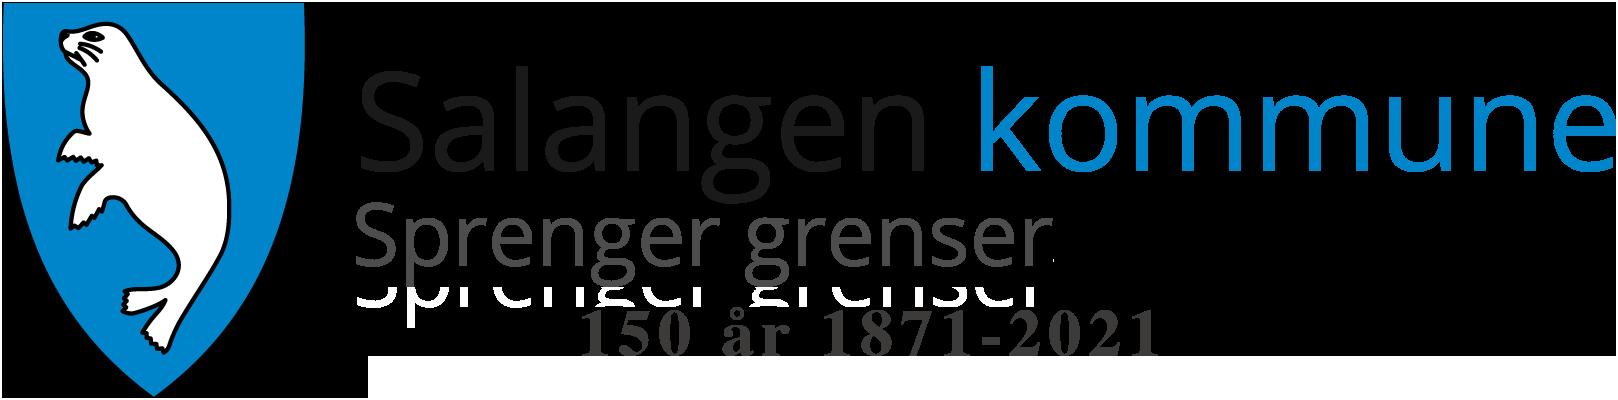 SALANGEN KOMMUNE logo